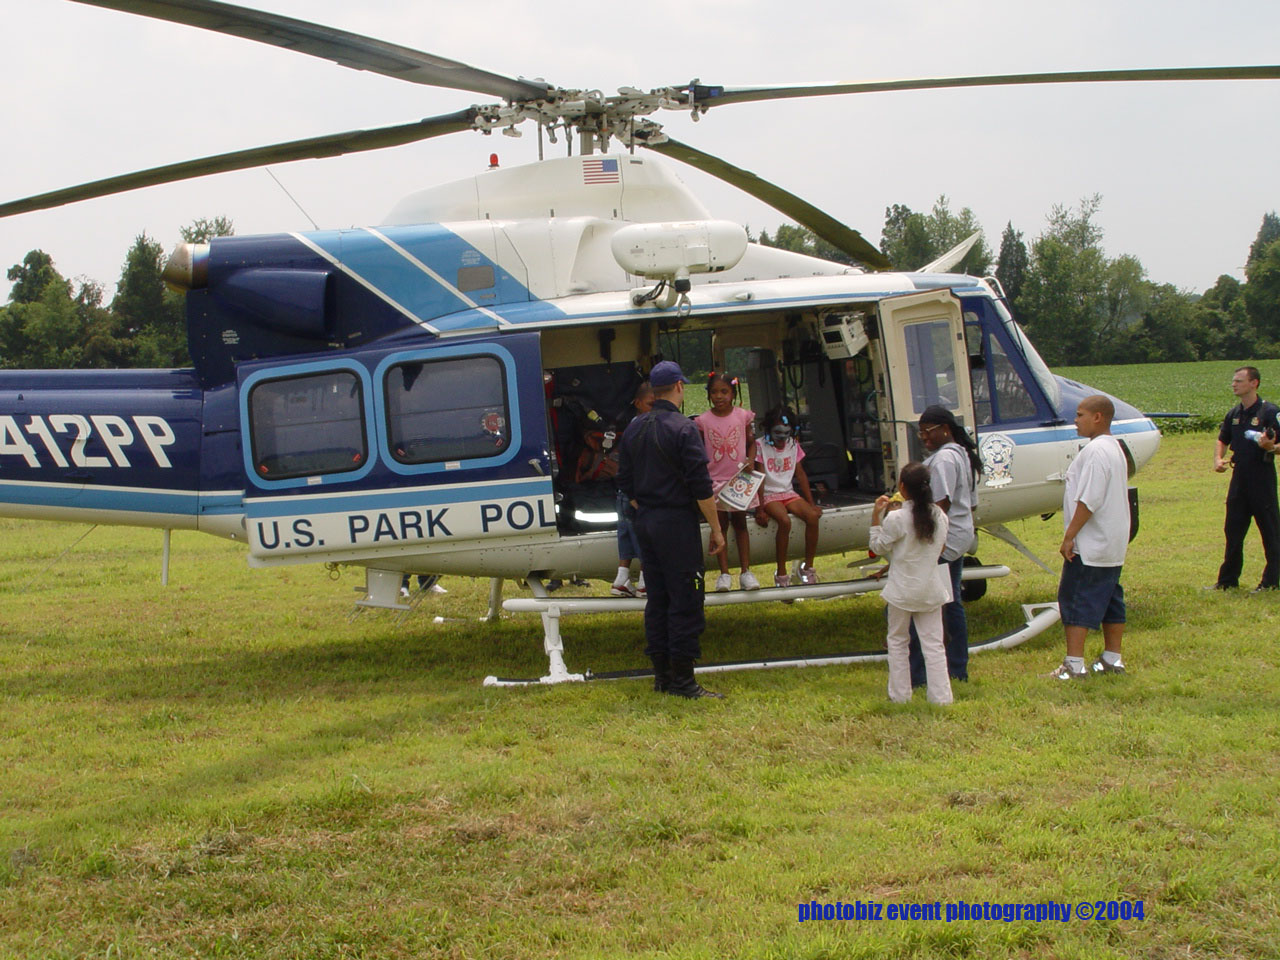 KLM-04 006.jpg